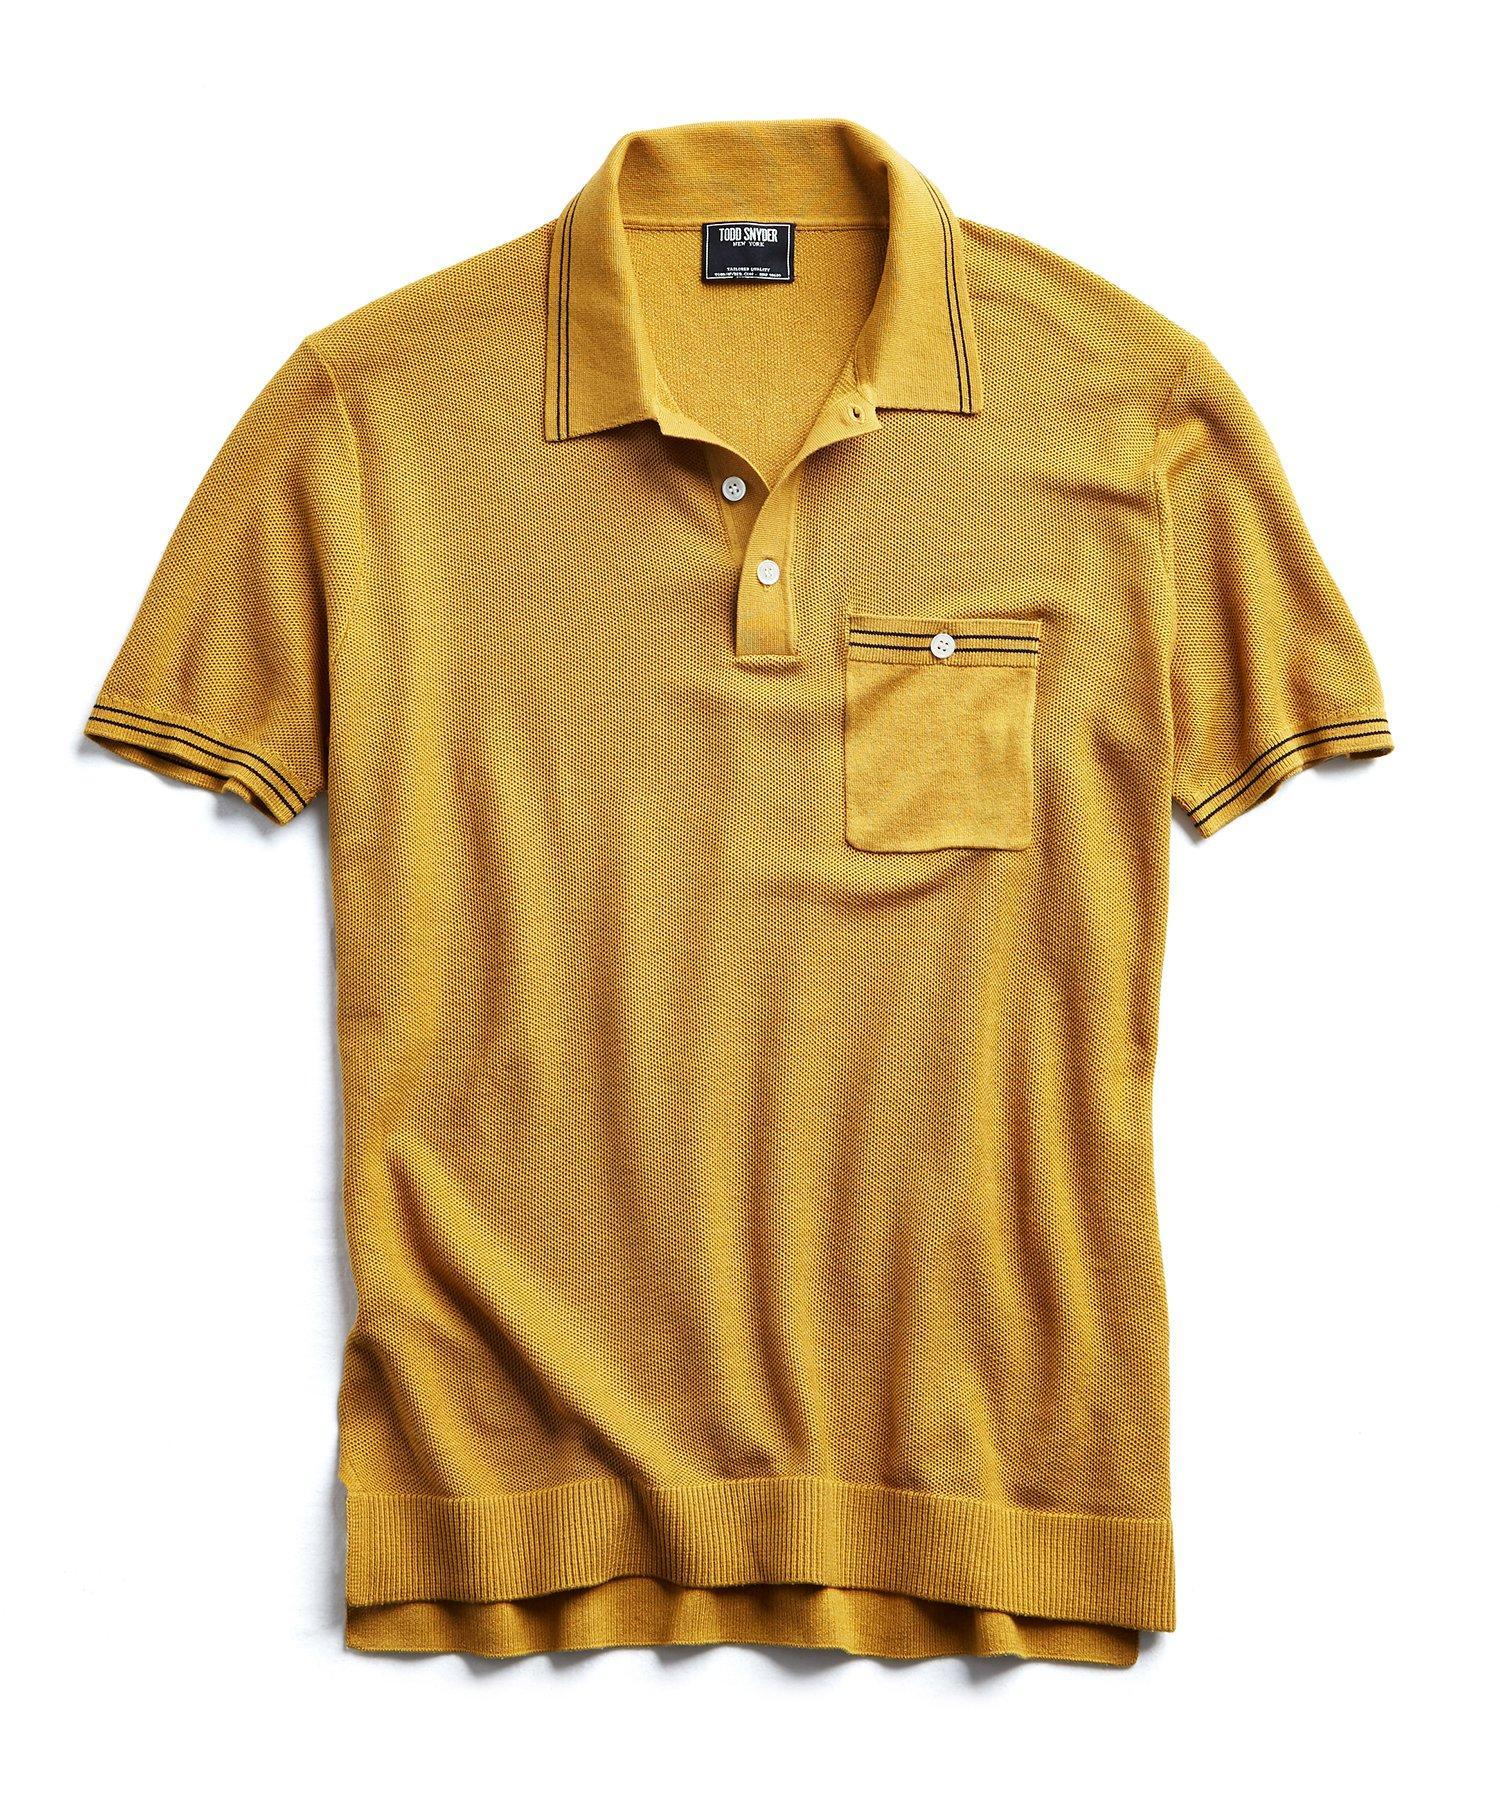 4faa2a0e Todd Snyder Tipped Cotton Silk Micro Mesh Tipped Polo In Mustard in ...